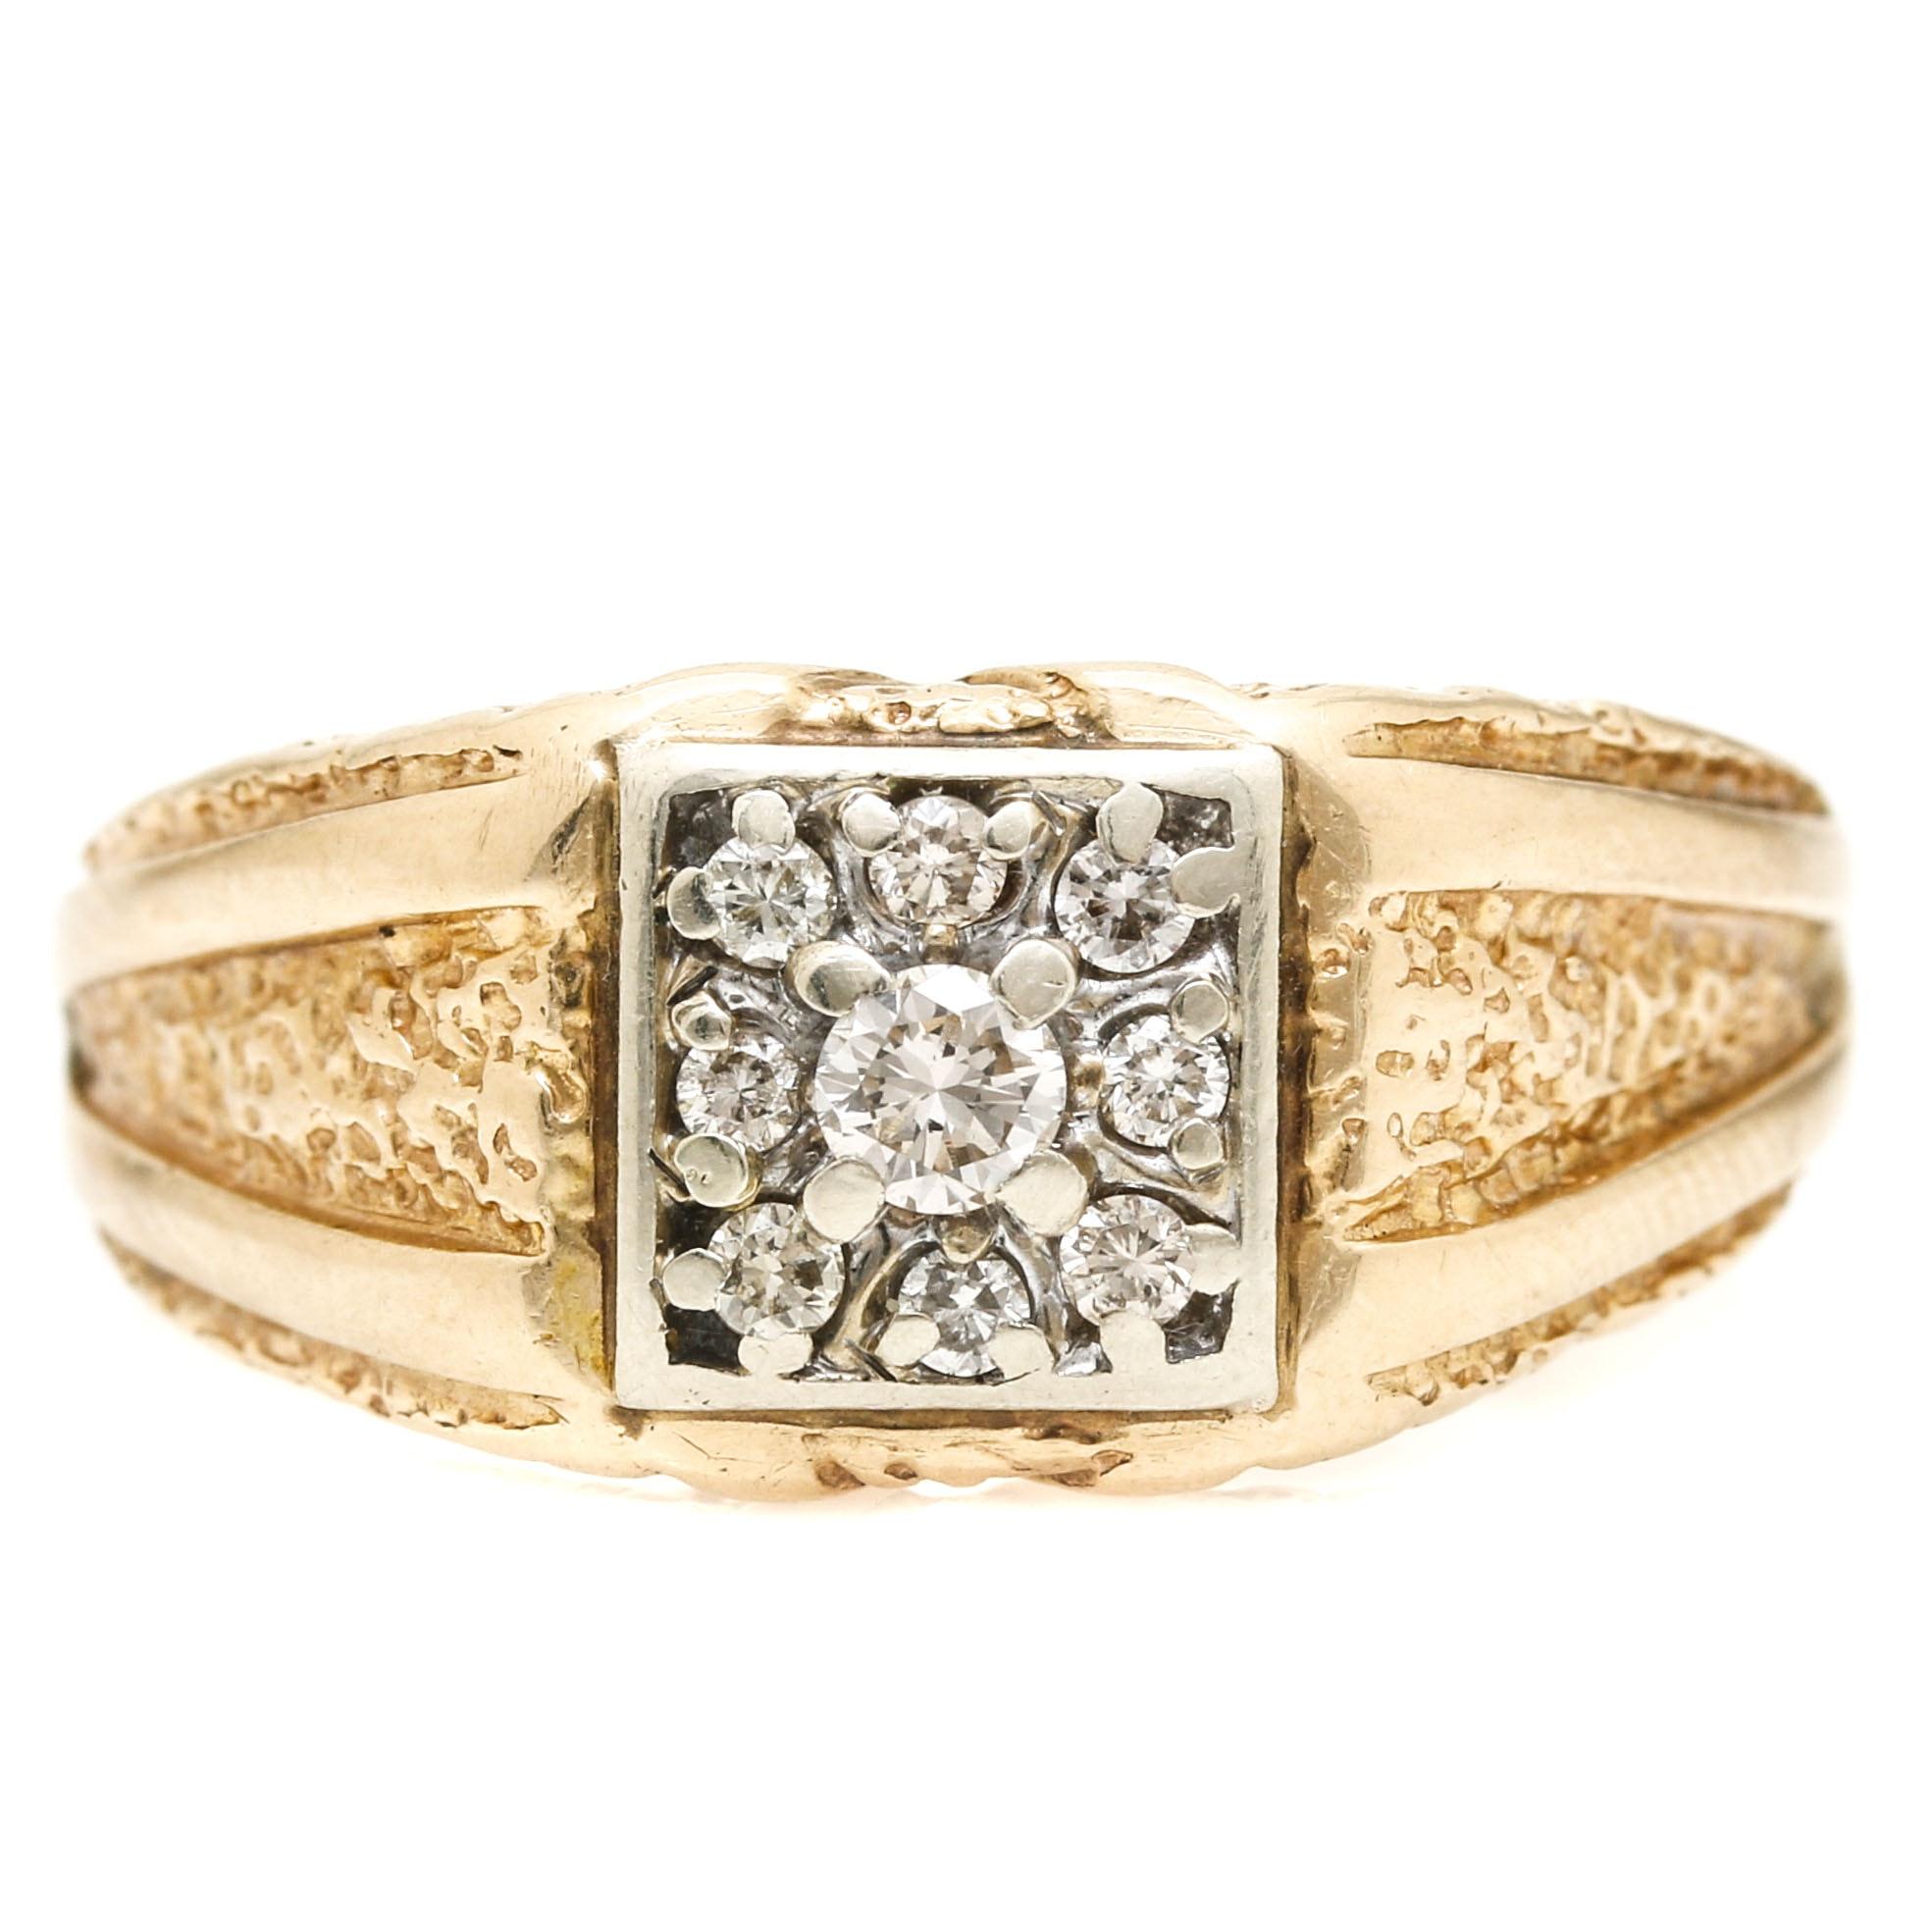 14K Yellow Gold Diamond Signet Ring